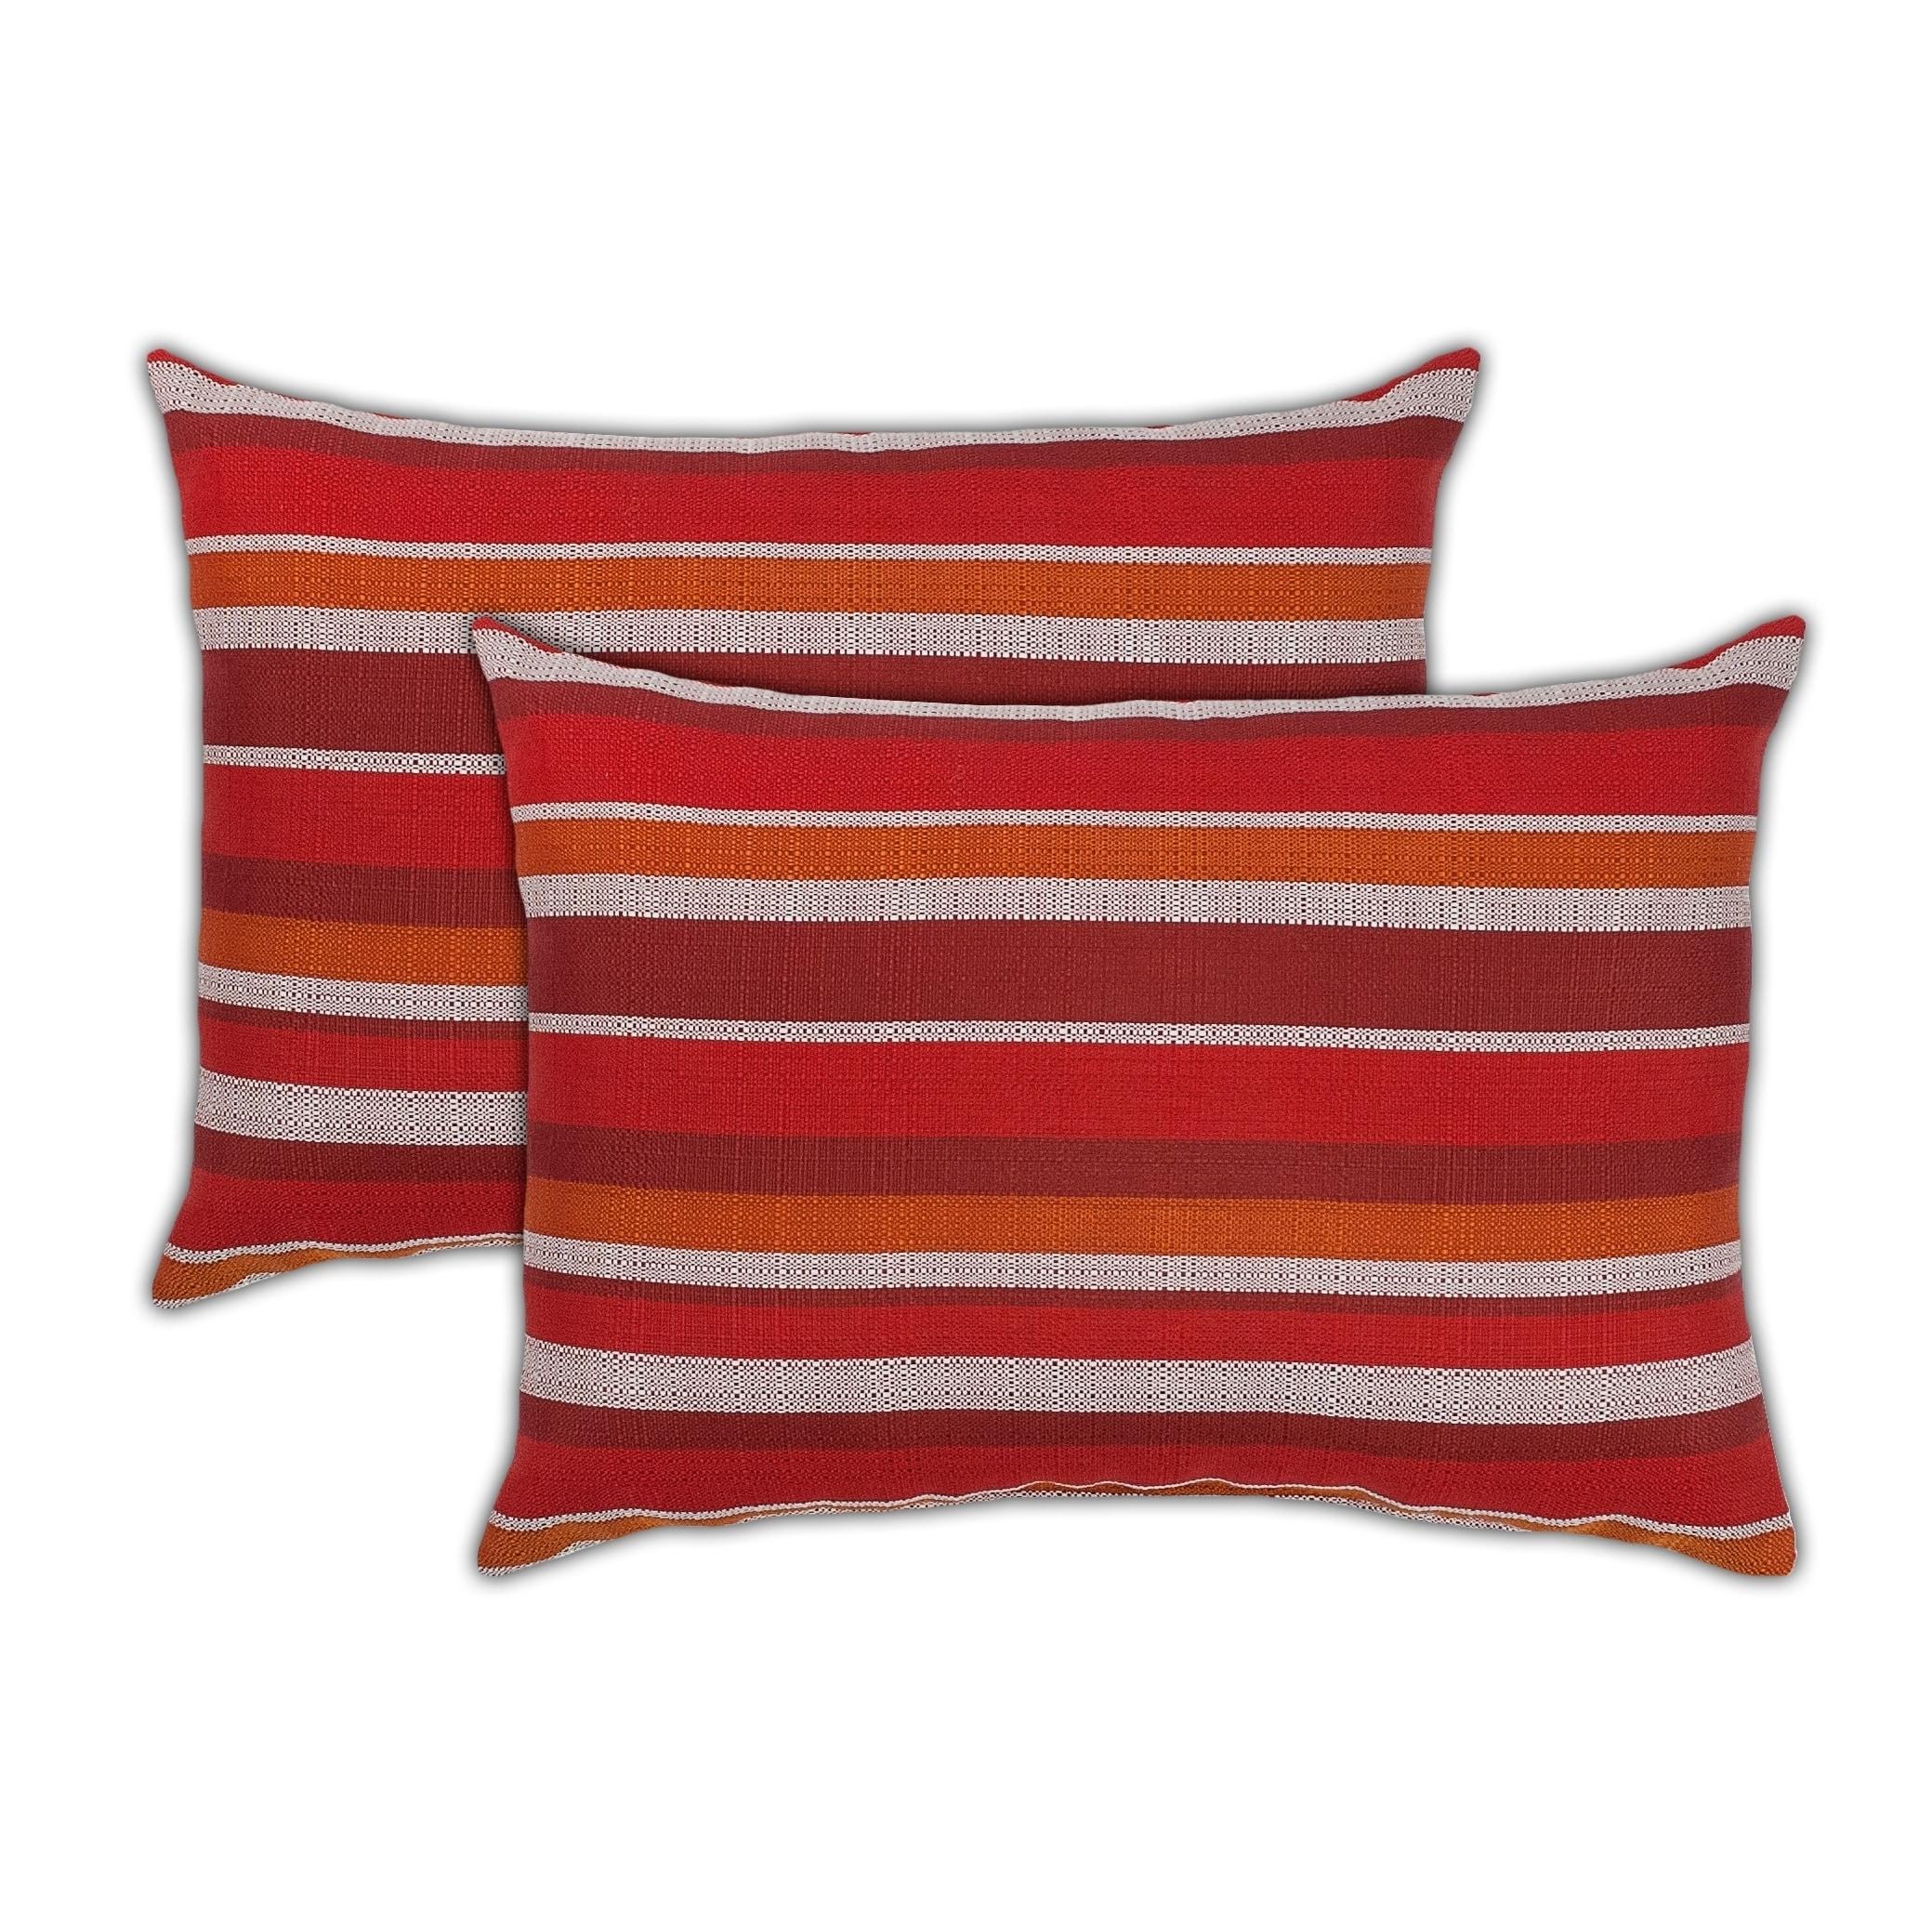 Sherry Kline Causeway Boudoir Outdoor Pillows (Set of 2)